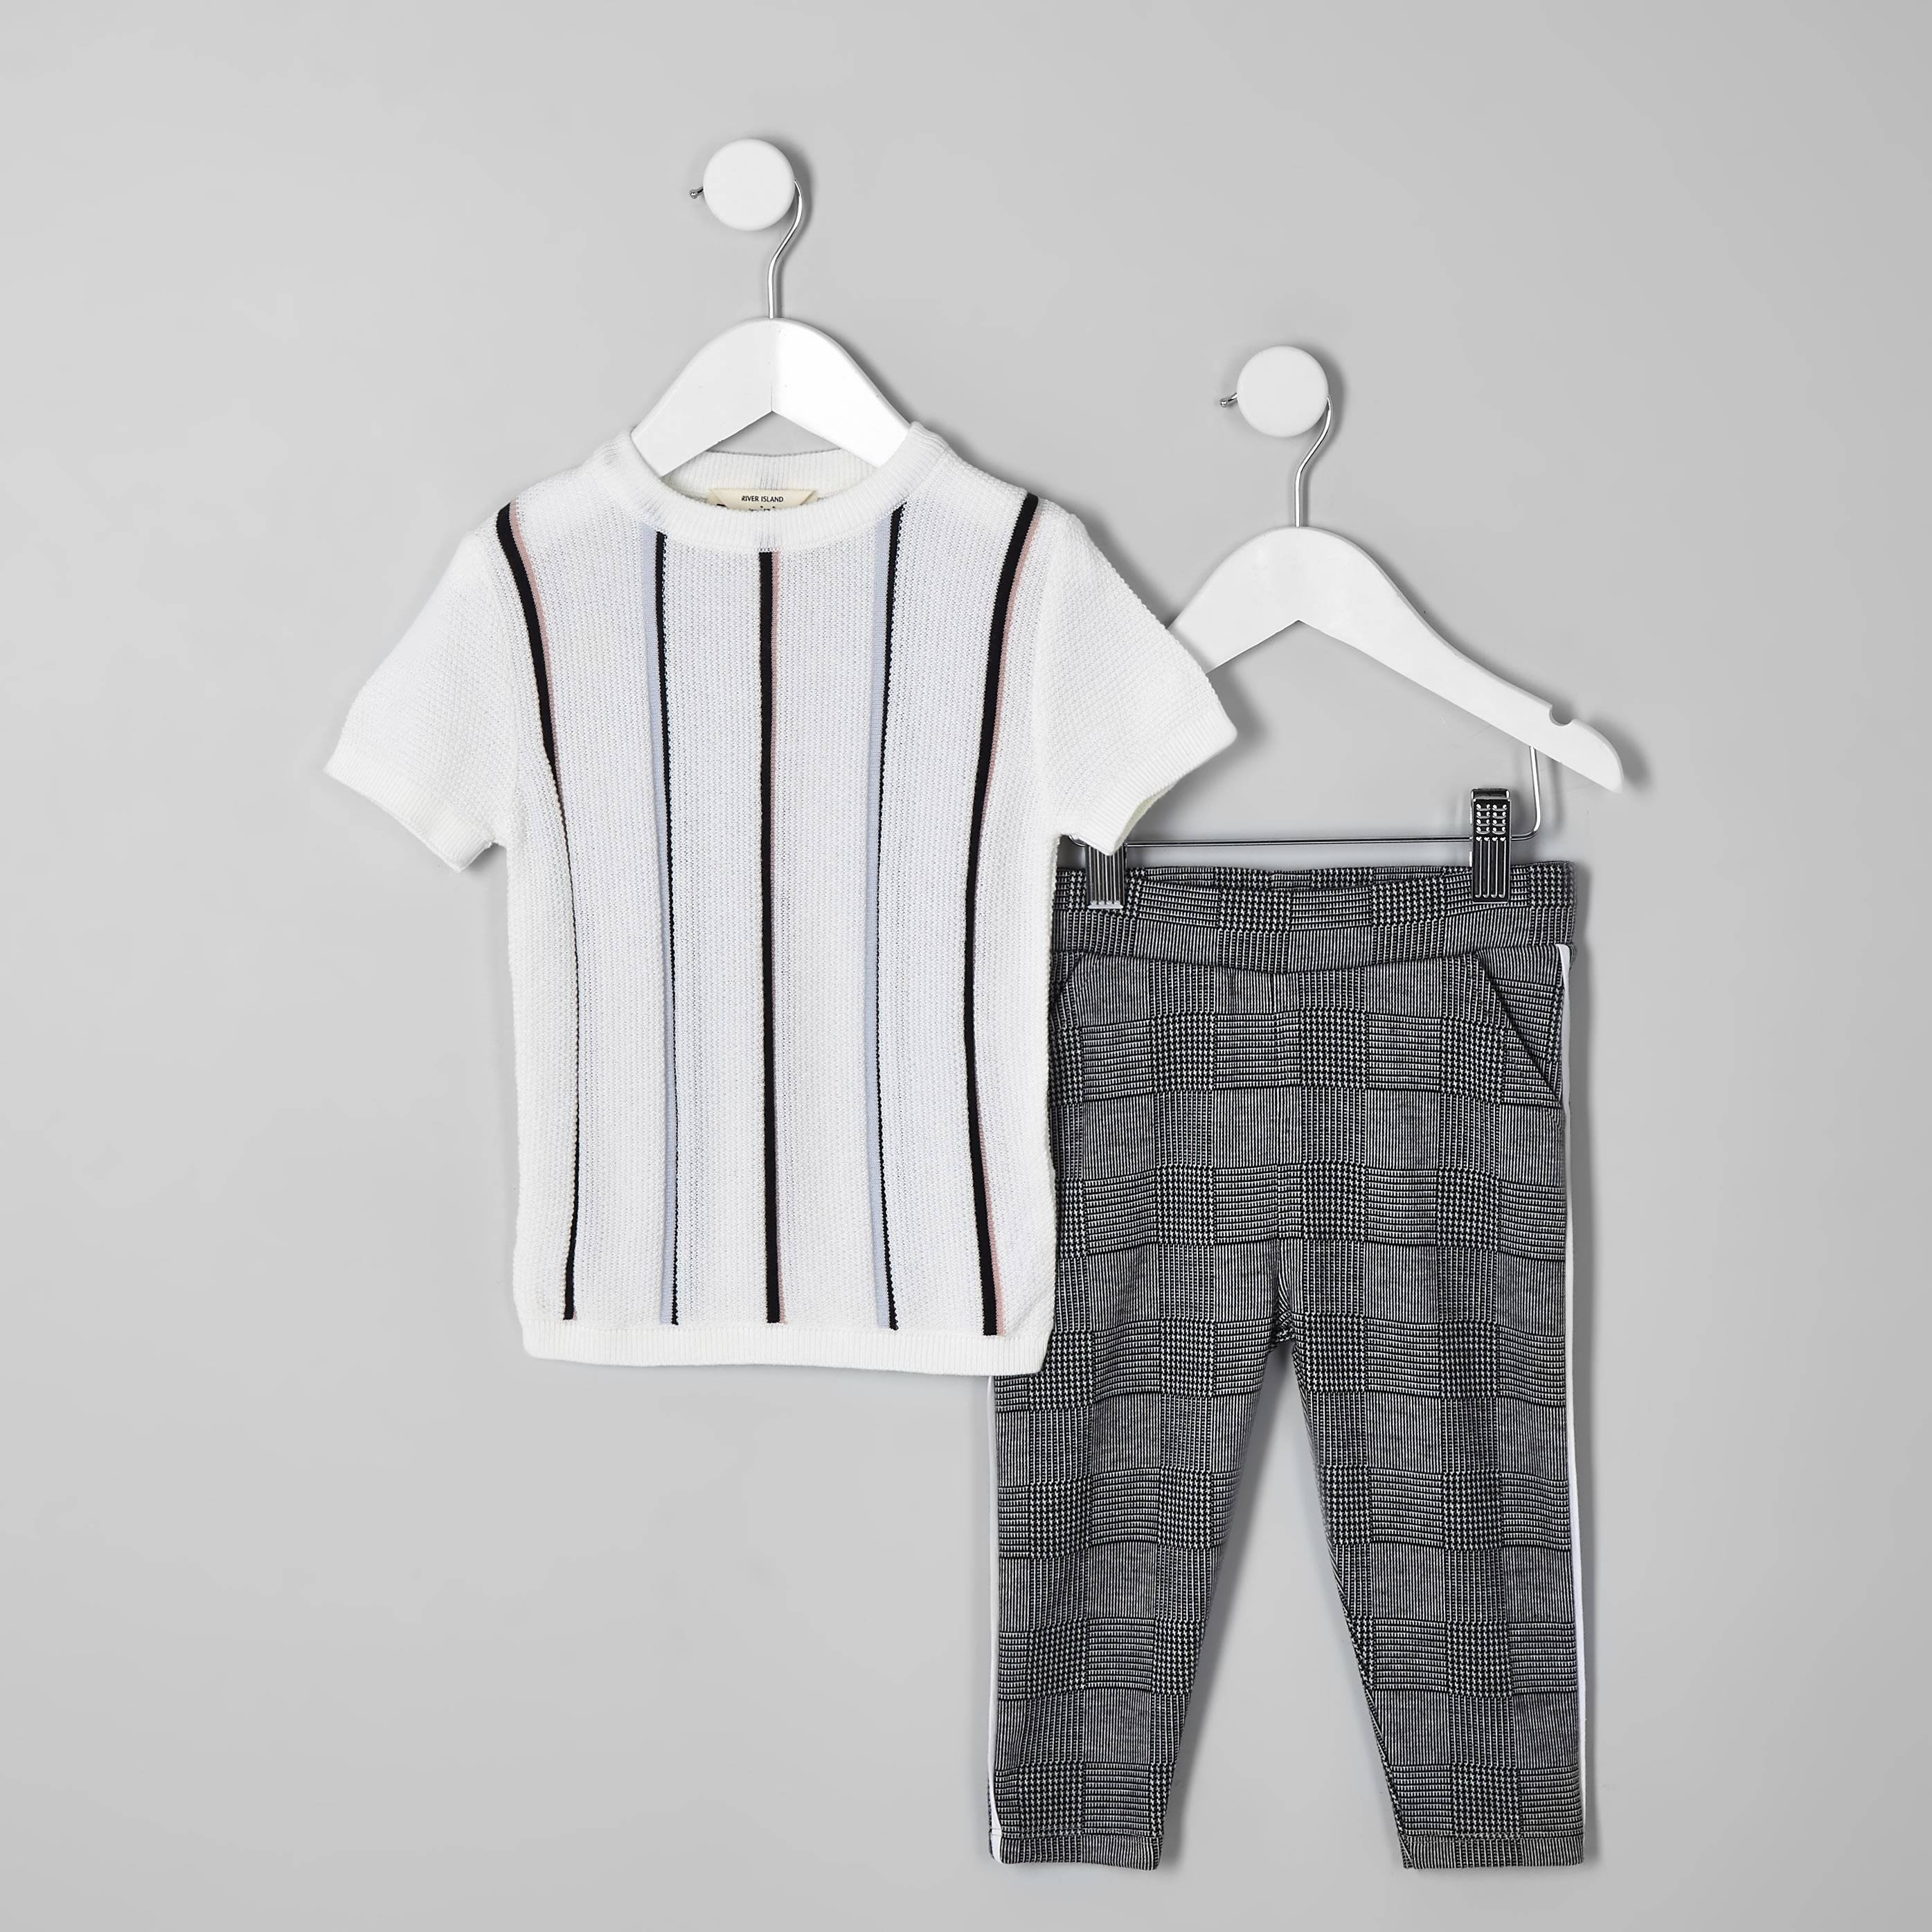 River Island Mens Baby Boys ecru stripe T-shirt outfit (0-3 Mths)